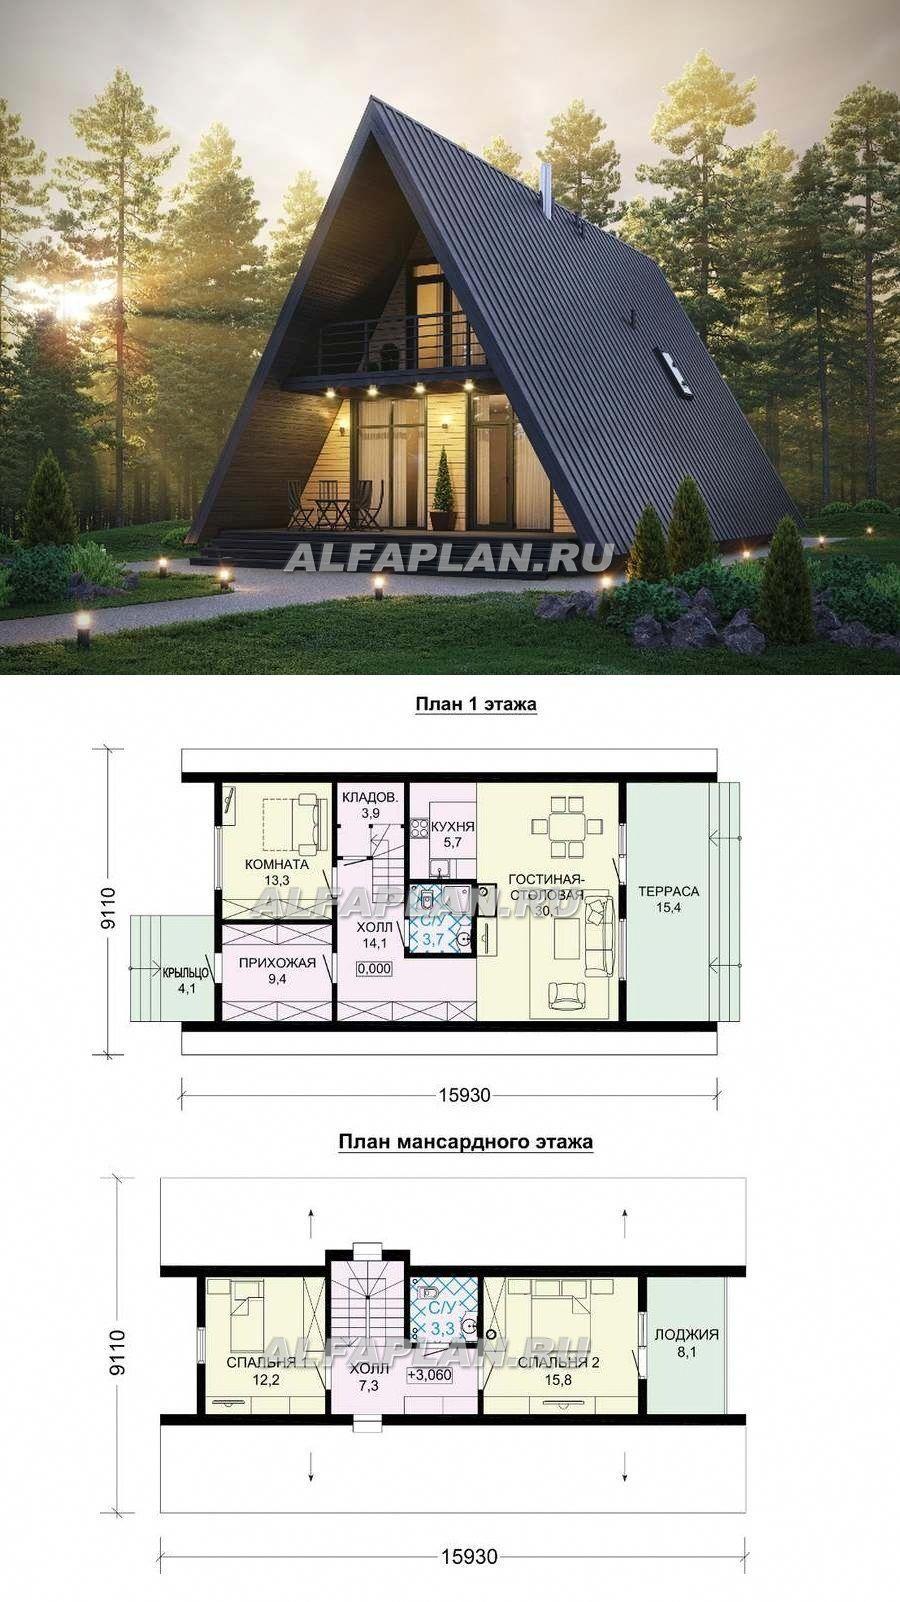 G133 Nebolshoj Karkasnyj Dom Shalash Obshaya Ploshad 127 1 M2 Alfaplan Ru Aframeinterior A Frame House A Frame House Plans A Frame Cabin Plans